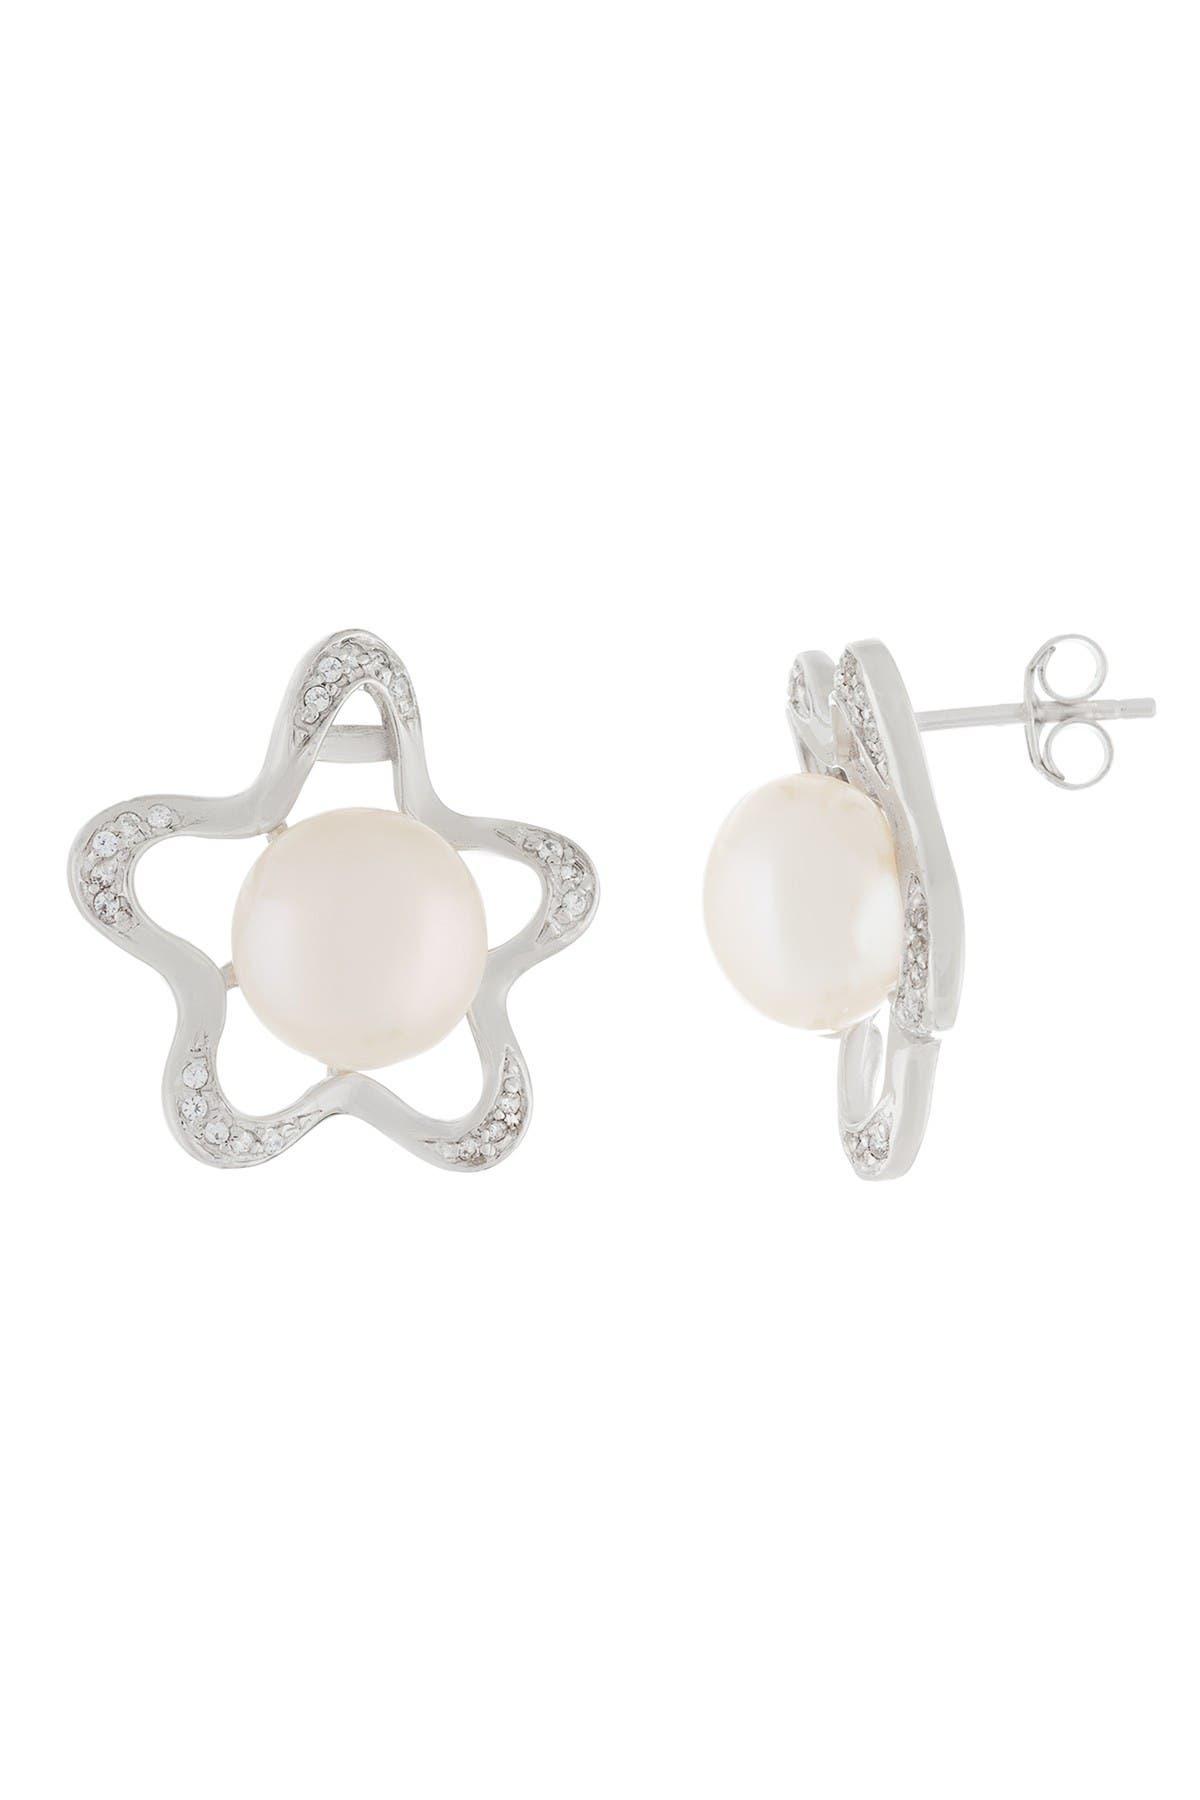 Image of Splendid Pearls Pave CZ & 7-7.5mm Cultured Freshwater Pearl Star Stud Earrings